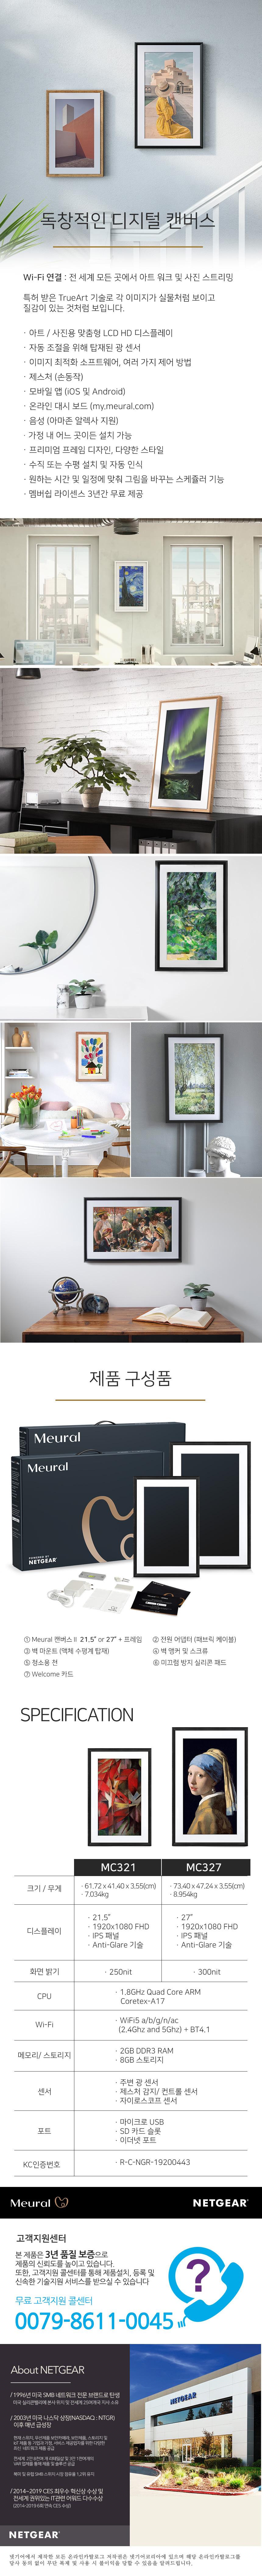 Meural_Catalog_02